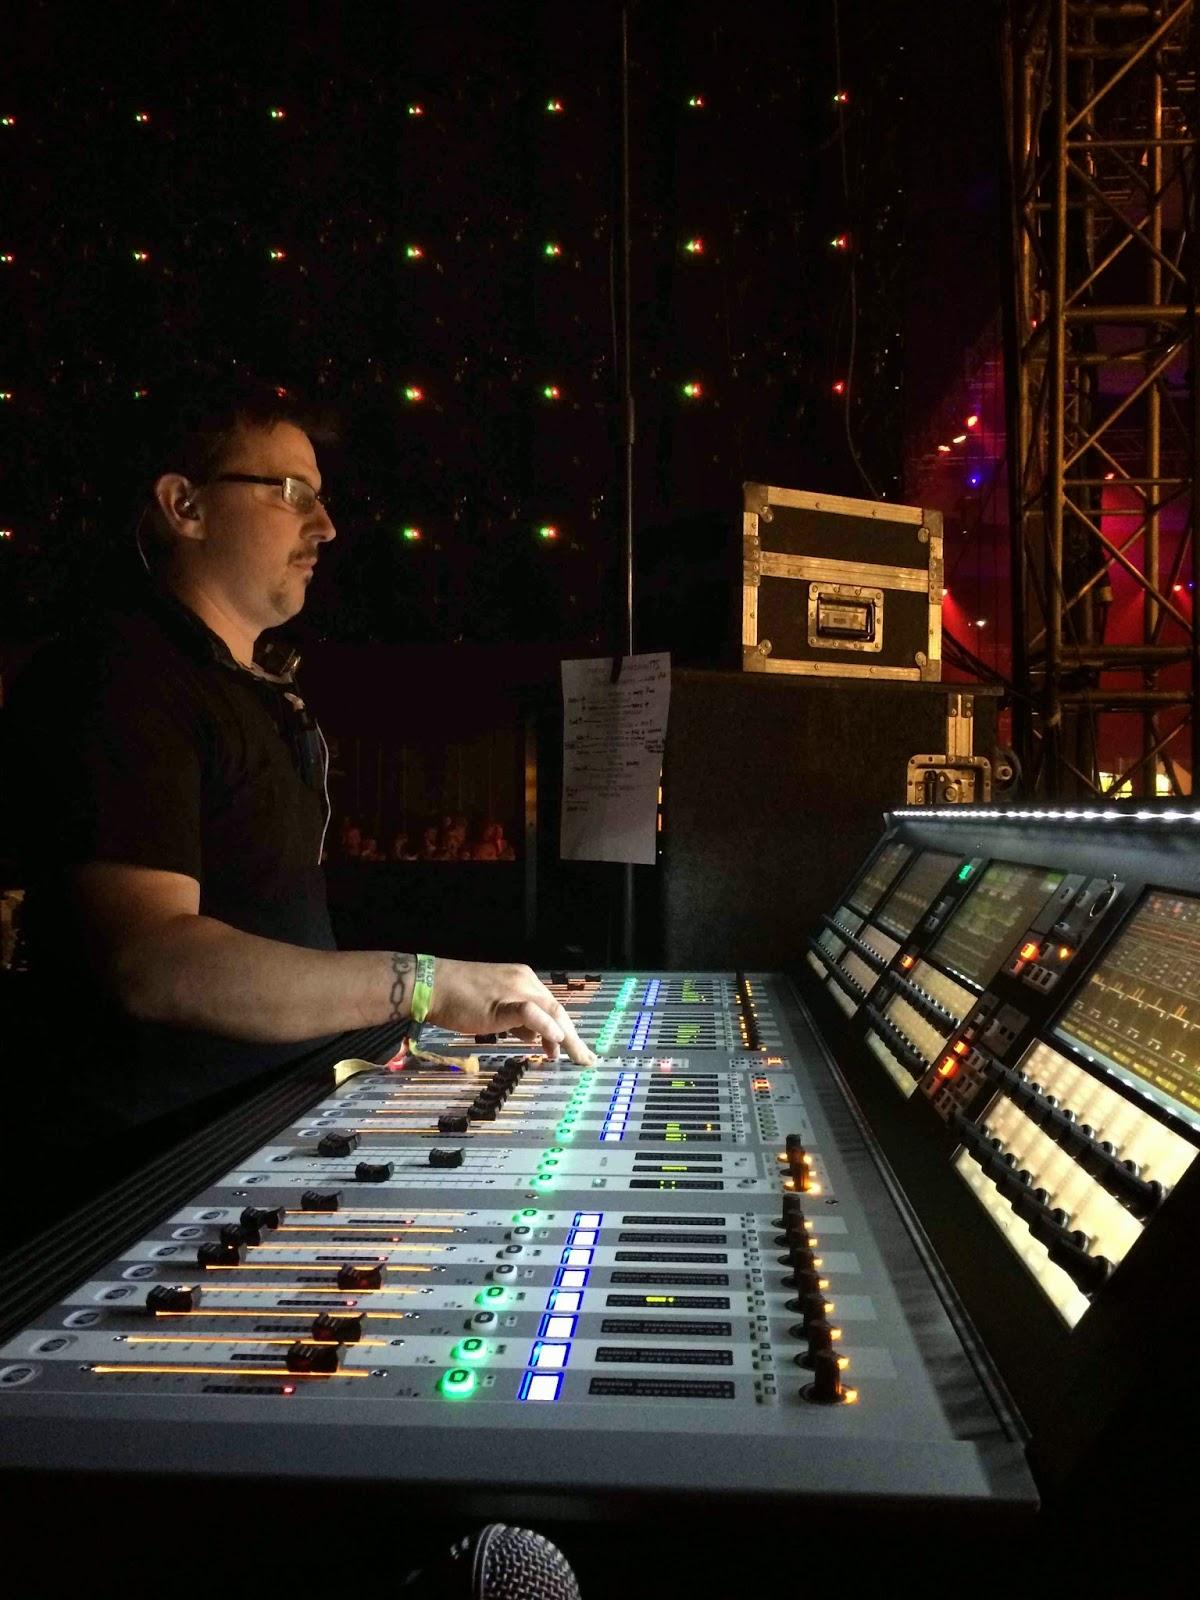 Harman Luxury Audio News: SSE Audio Group Adds HARMAN Soundcraft Vi3000 To Extensive Inventory